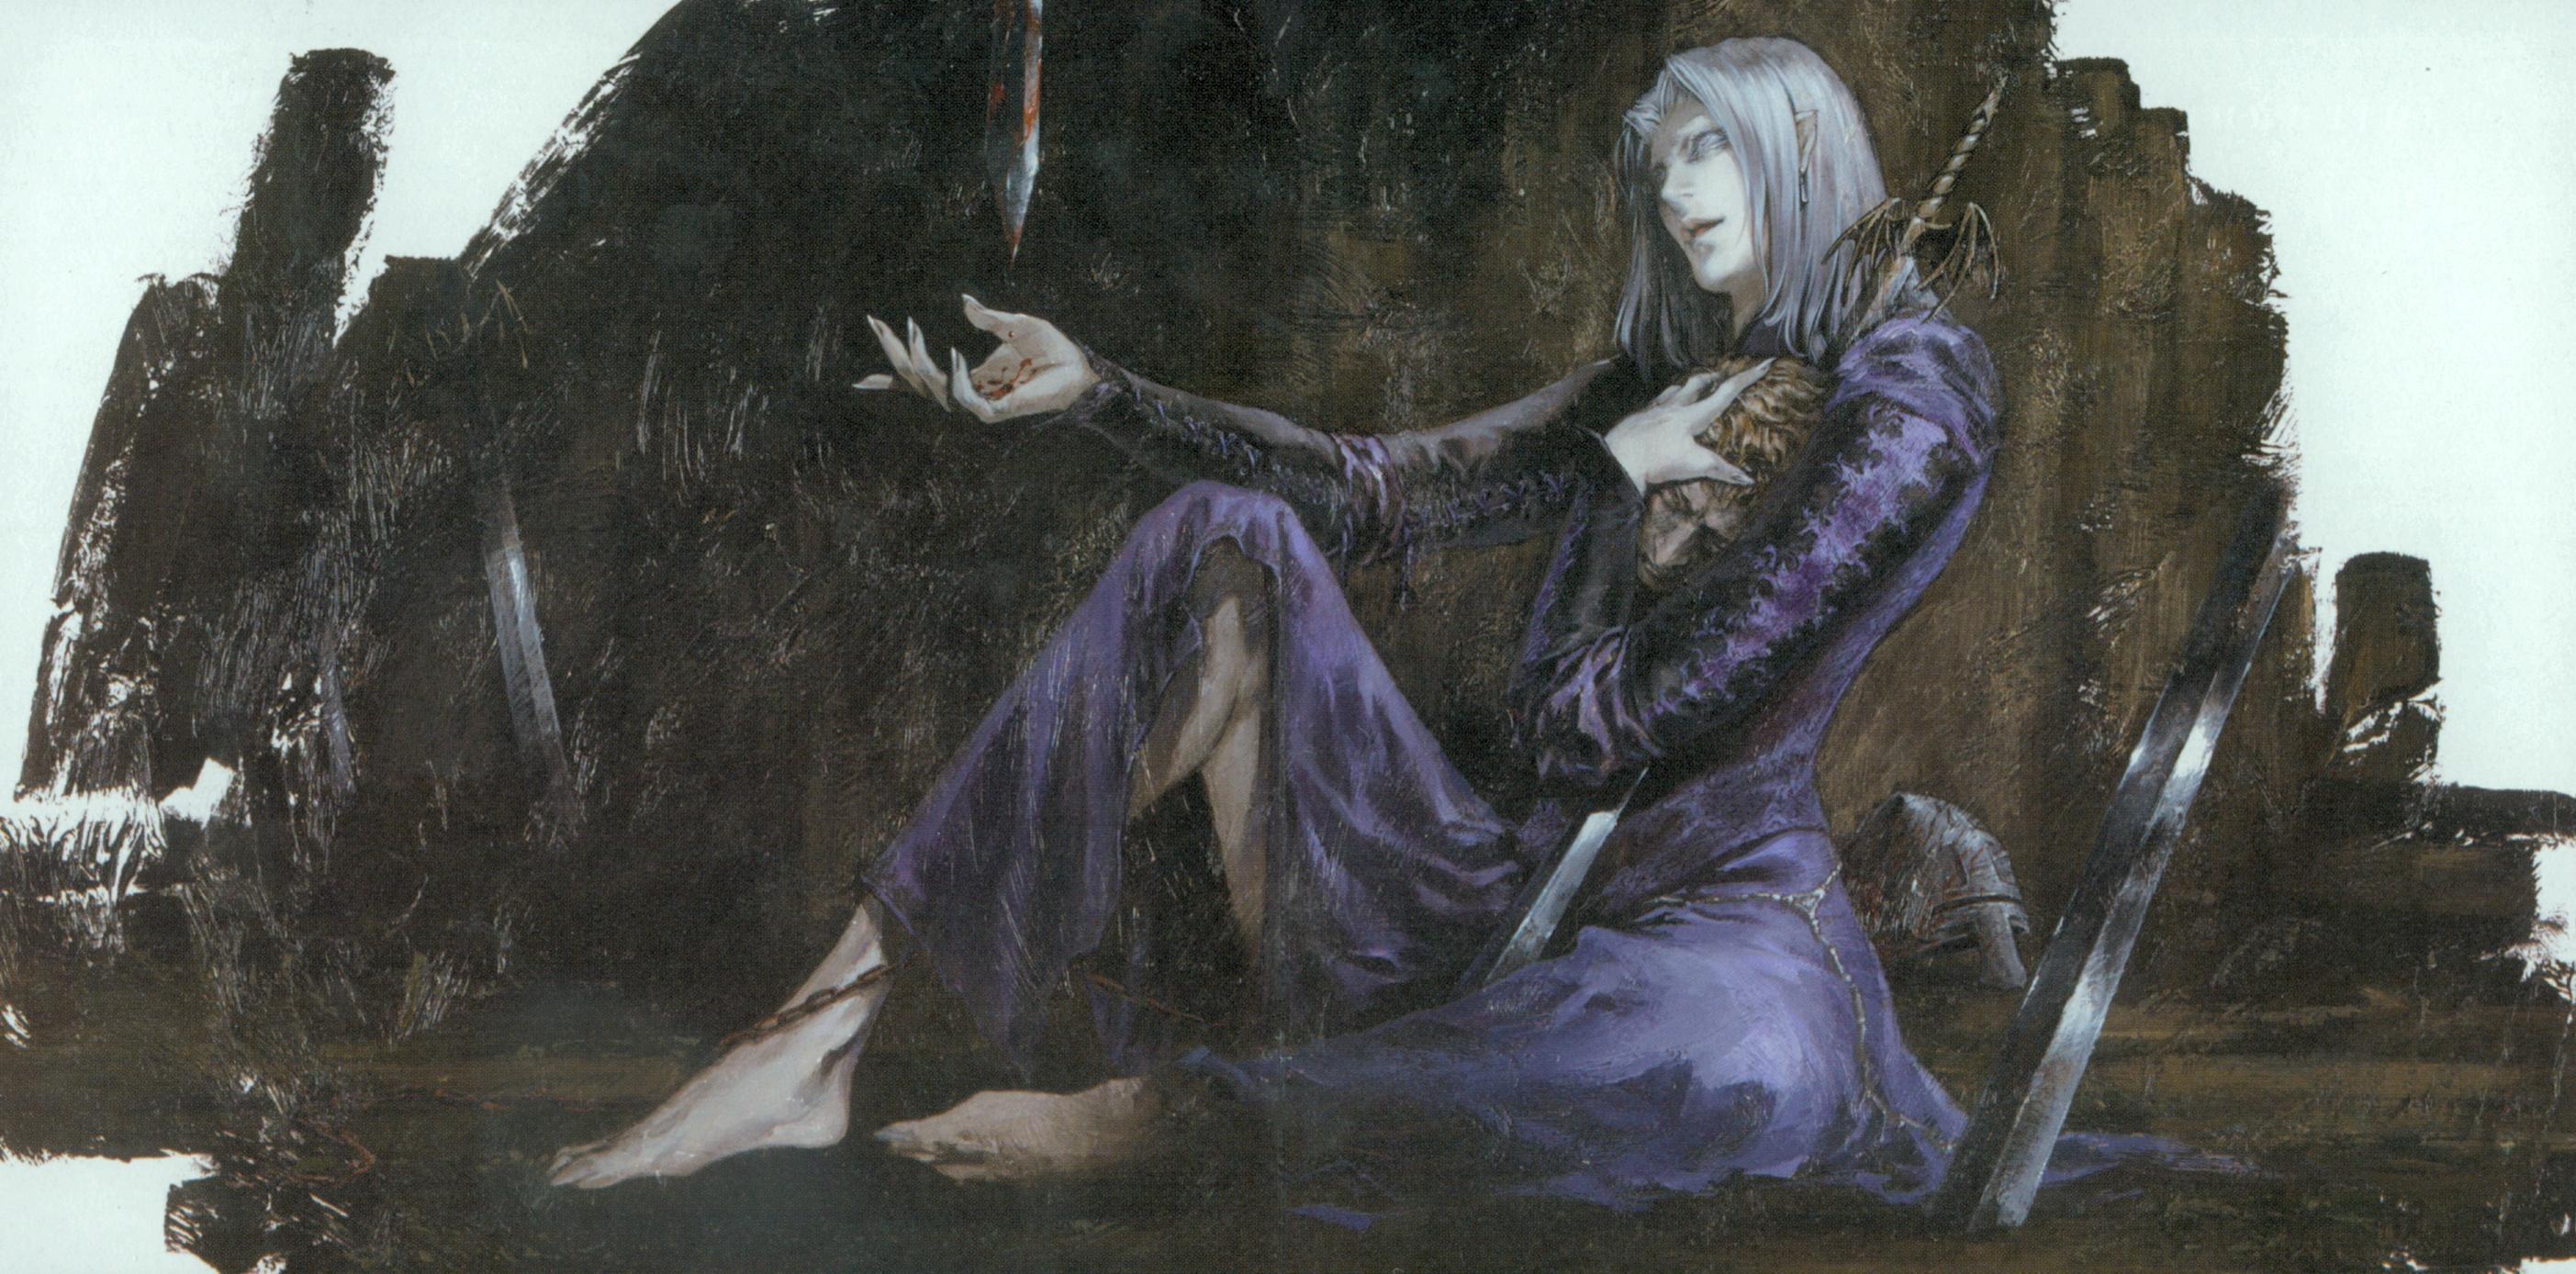 Castlevania Hd Wallpaper Background Image 2806x1388 Id